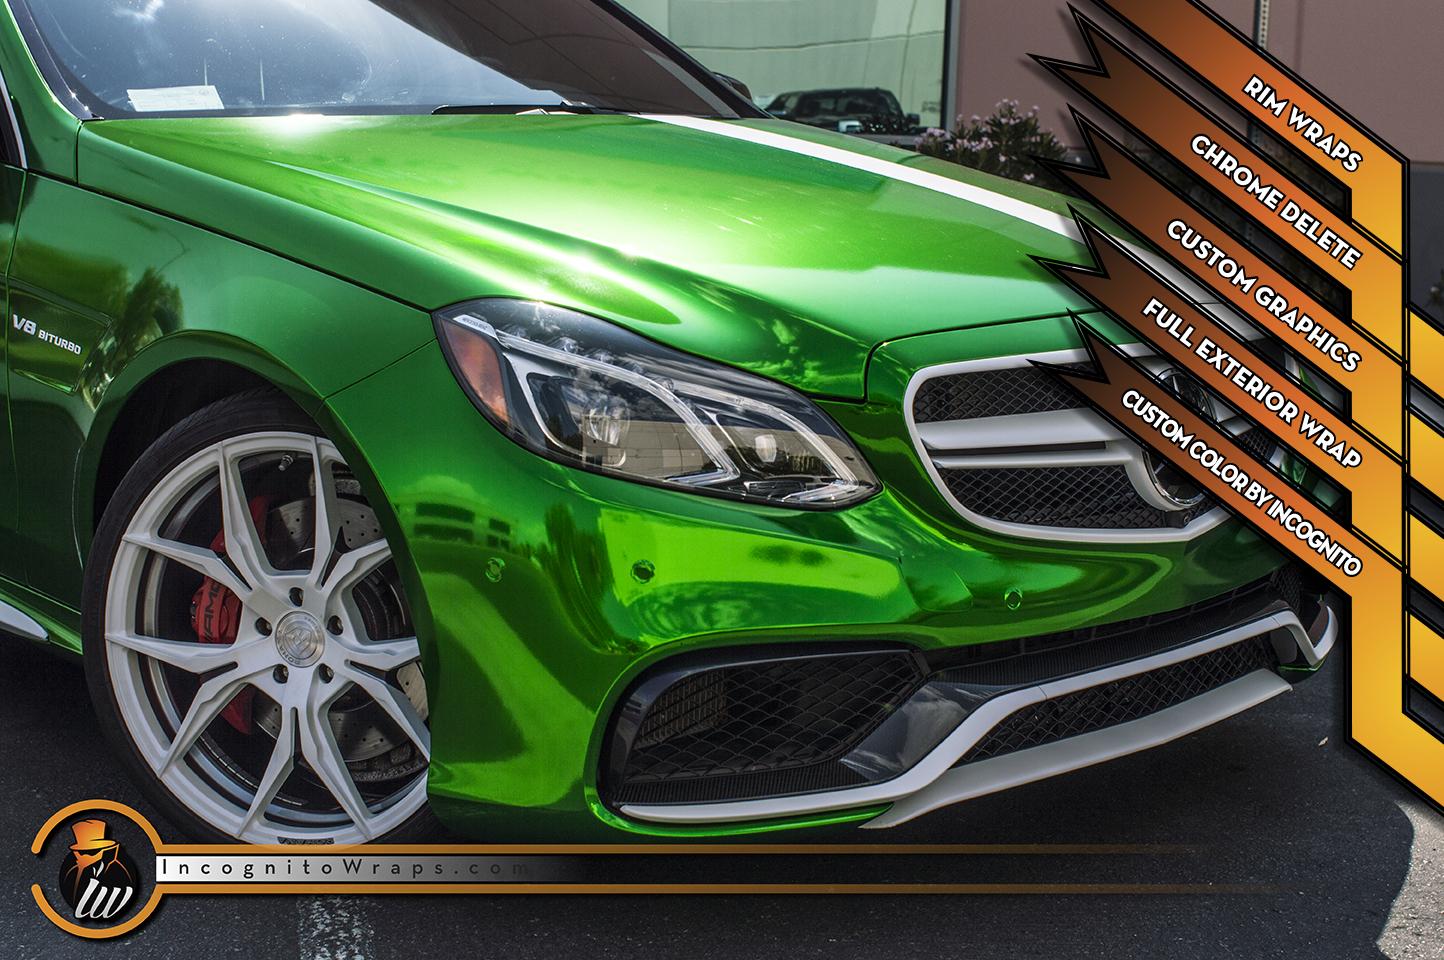 Mercedes E 63 S - Custom Candy Green Chrome